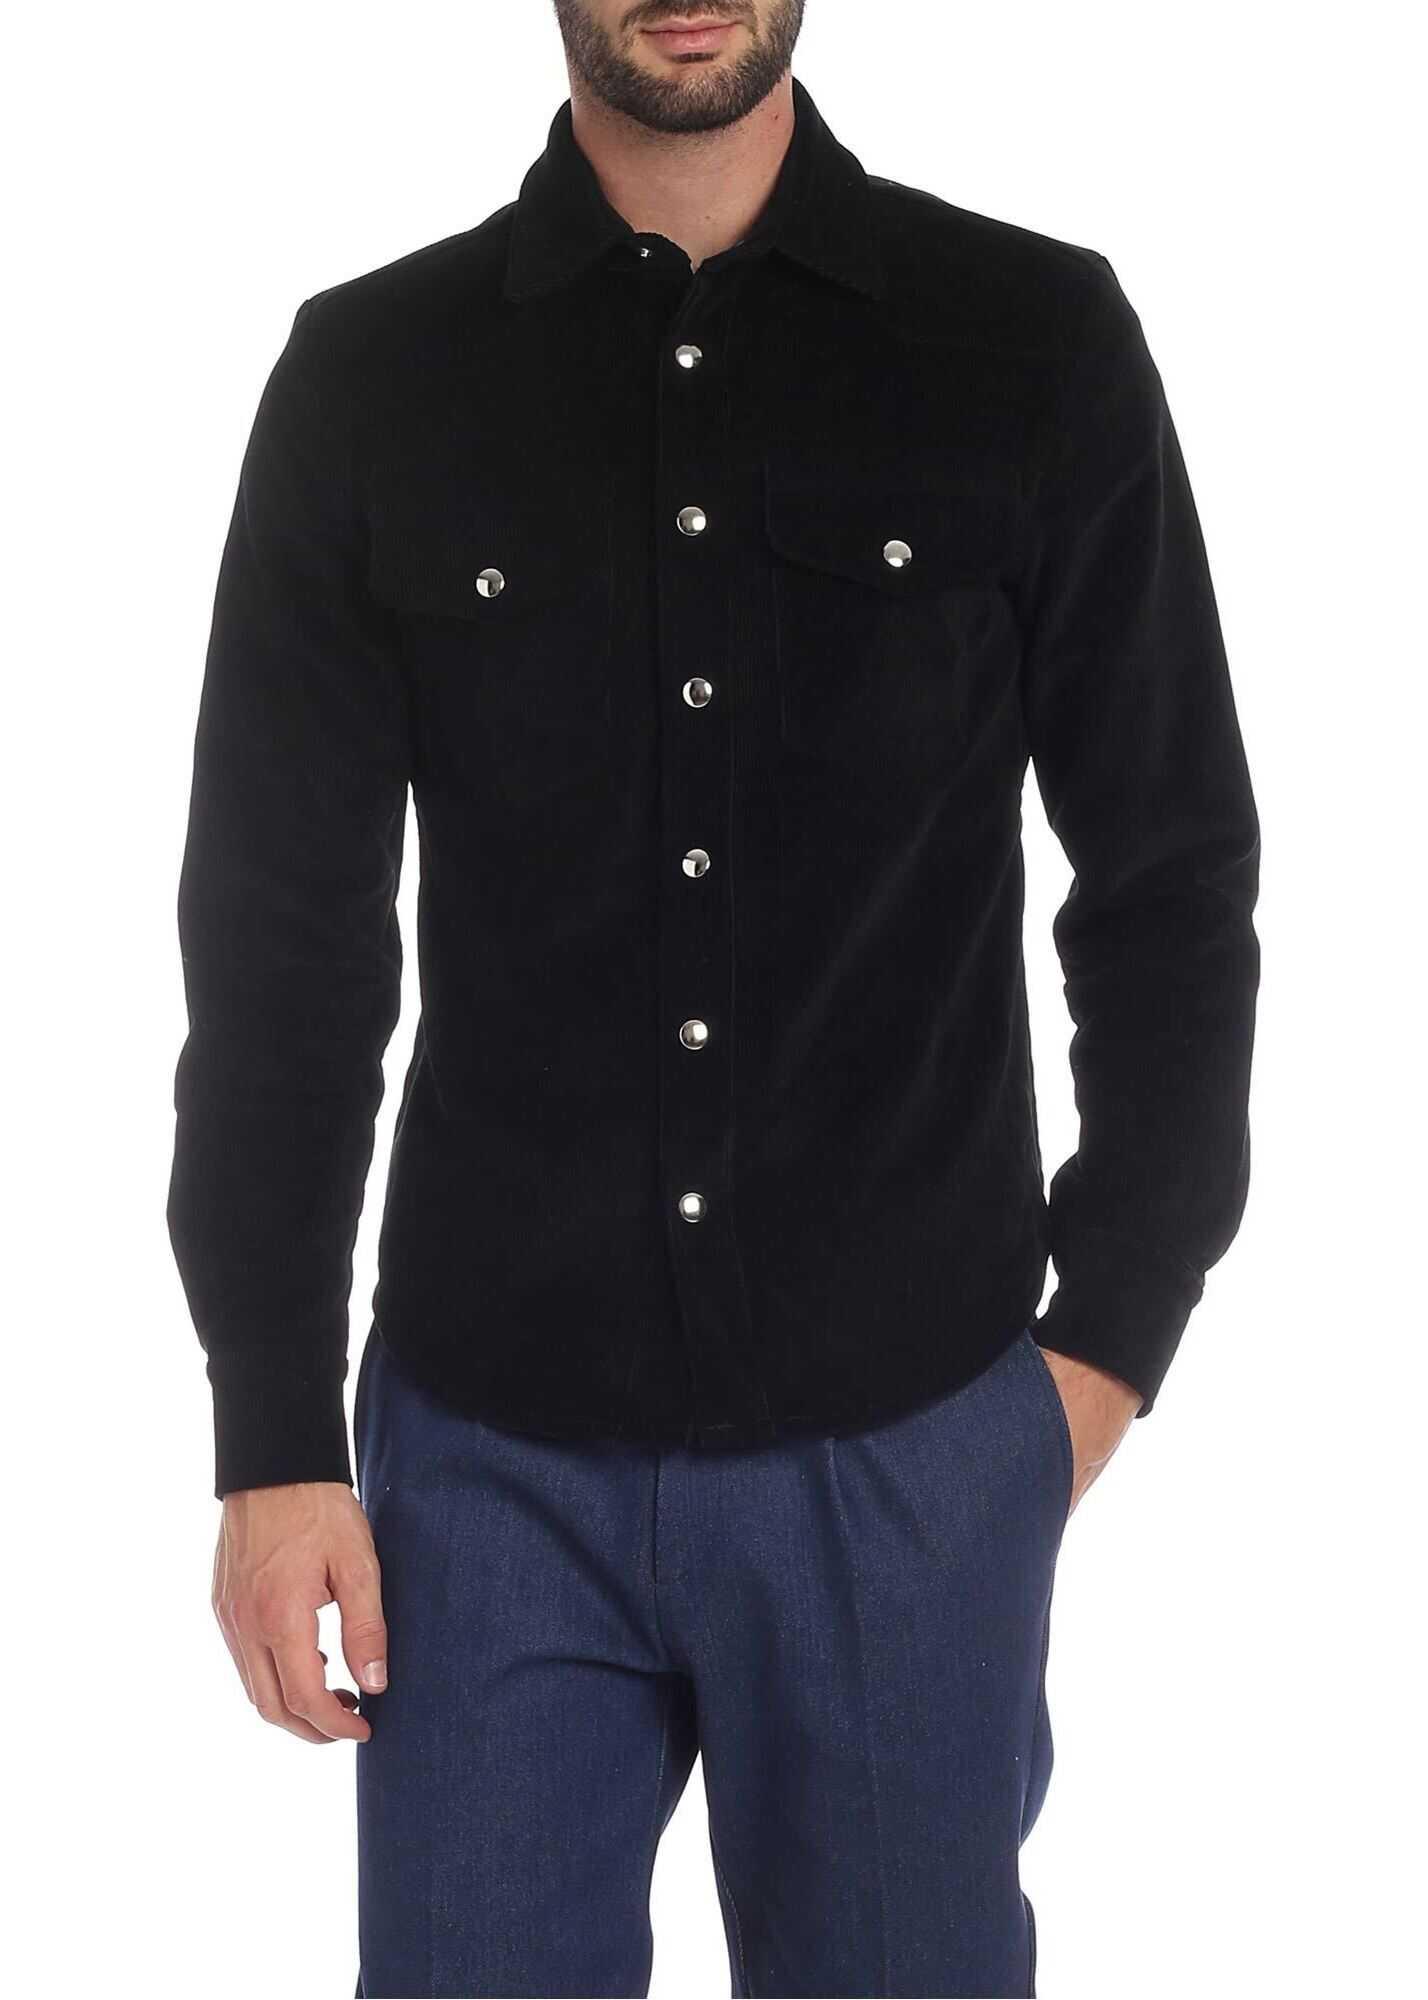 Ribbon Clothing Corduroy Cotton Shirt In Black Black imagine